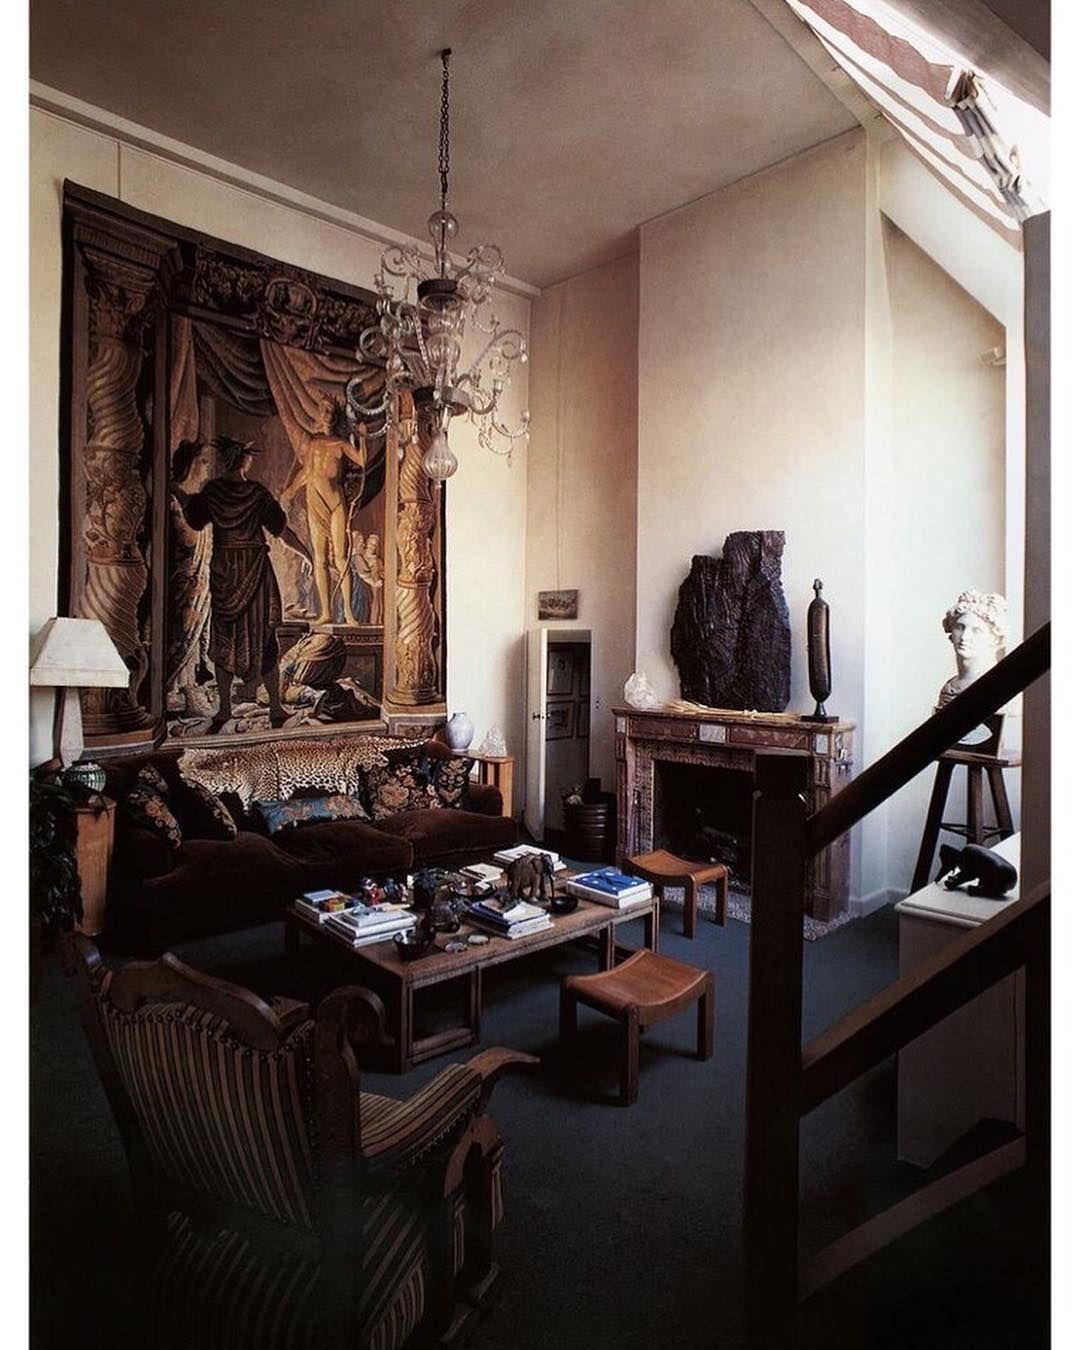 Camille Vergnes On Instagram Appartement De Pascal Greggory En 1988 Photo Par Philippe Girardeau Decoration Cheap Home Decor House Interior Dark Interiors